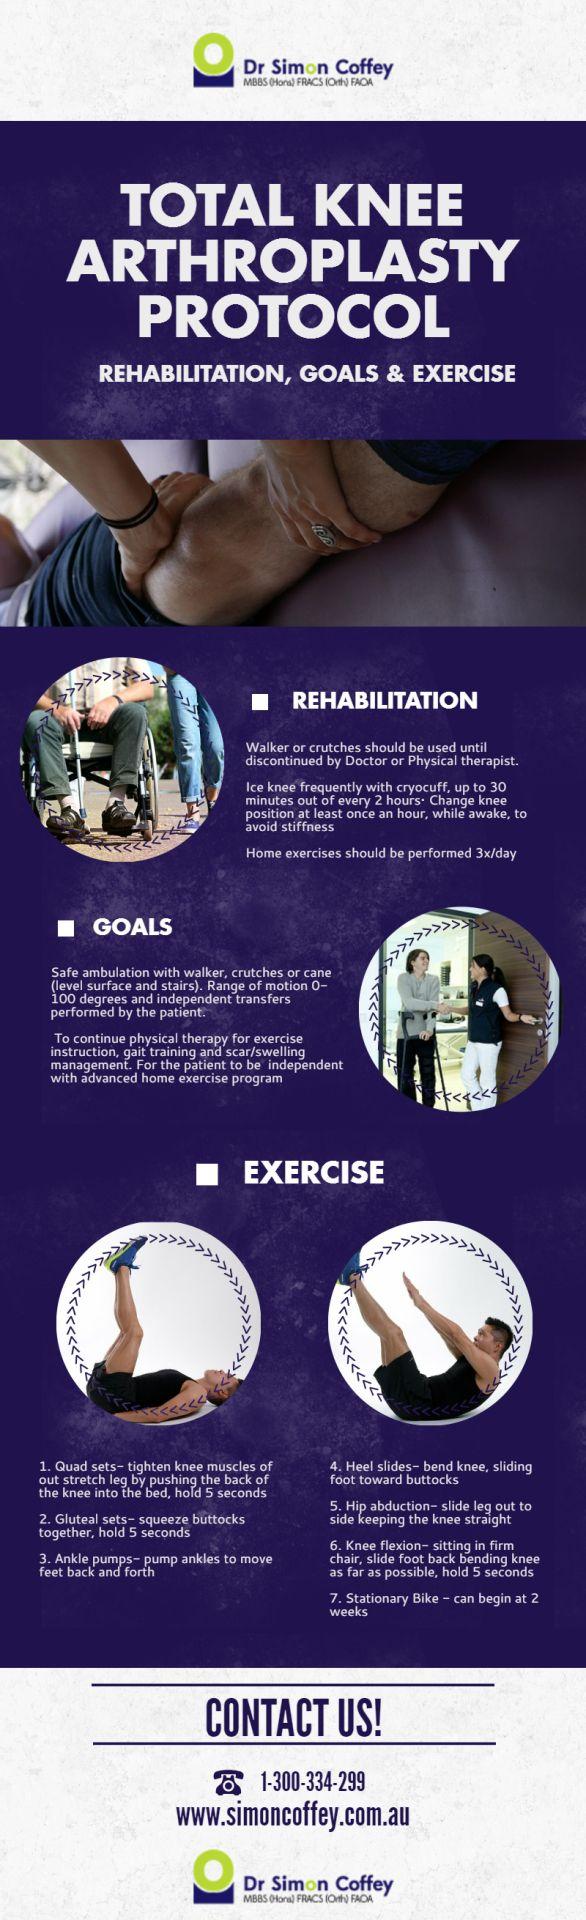 Total Knee Arthroplasty Protocol Rehabilitation, Golas & Exercise. #TotalkneeArthroplasty #Rehabilitation #GolasandExercise #orthopaedicsurgeon